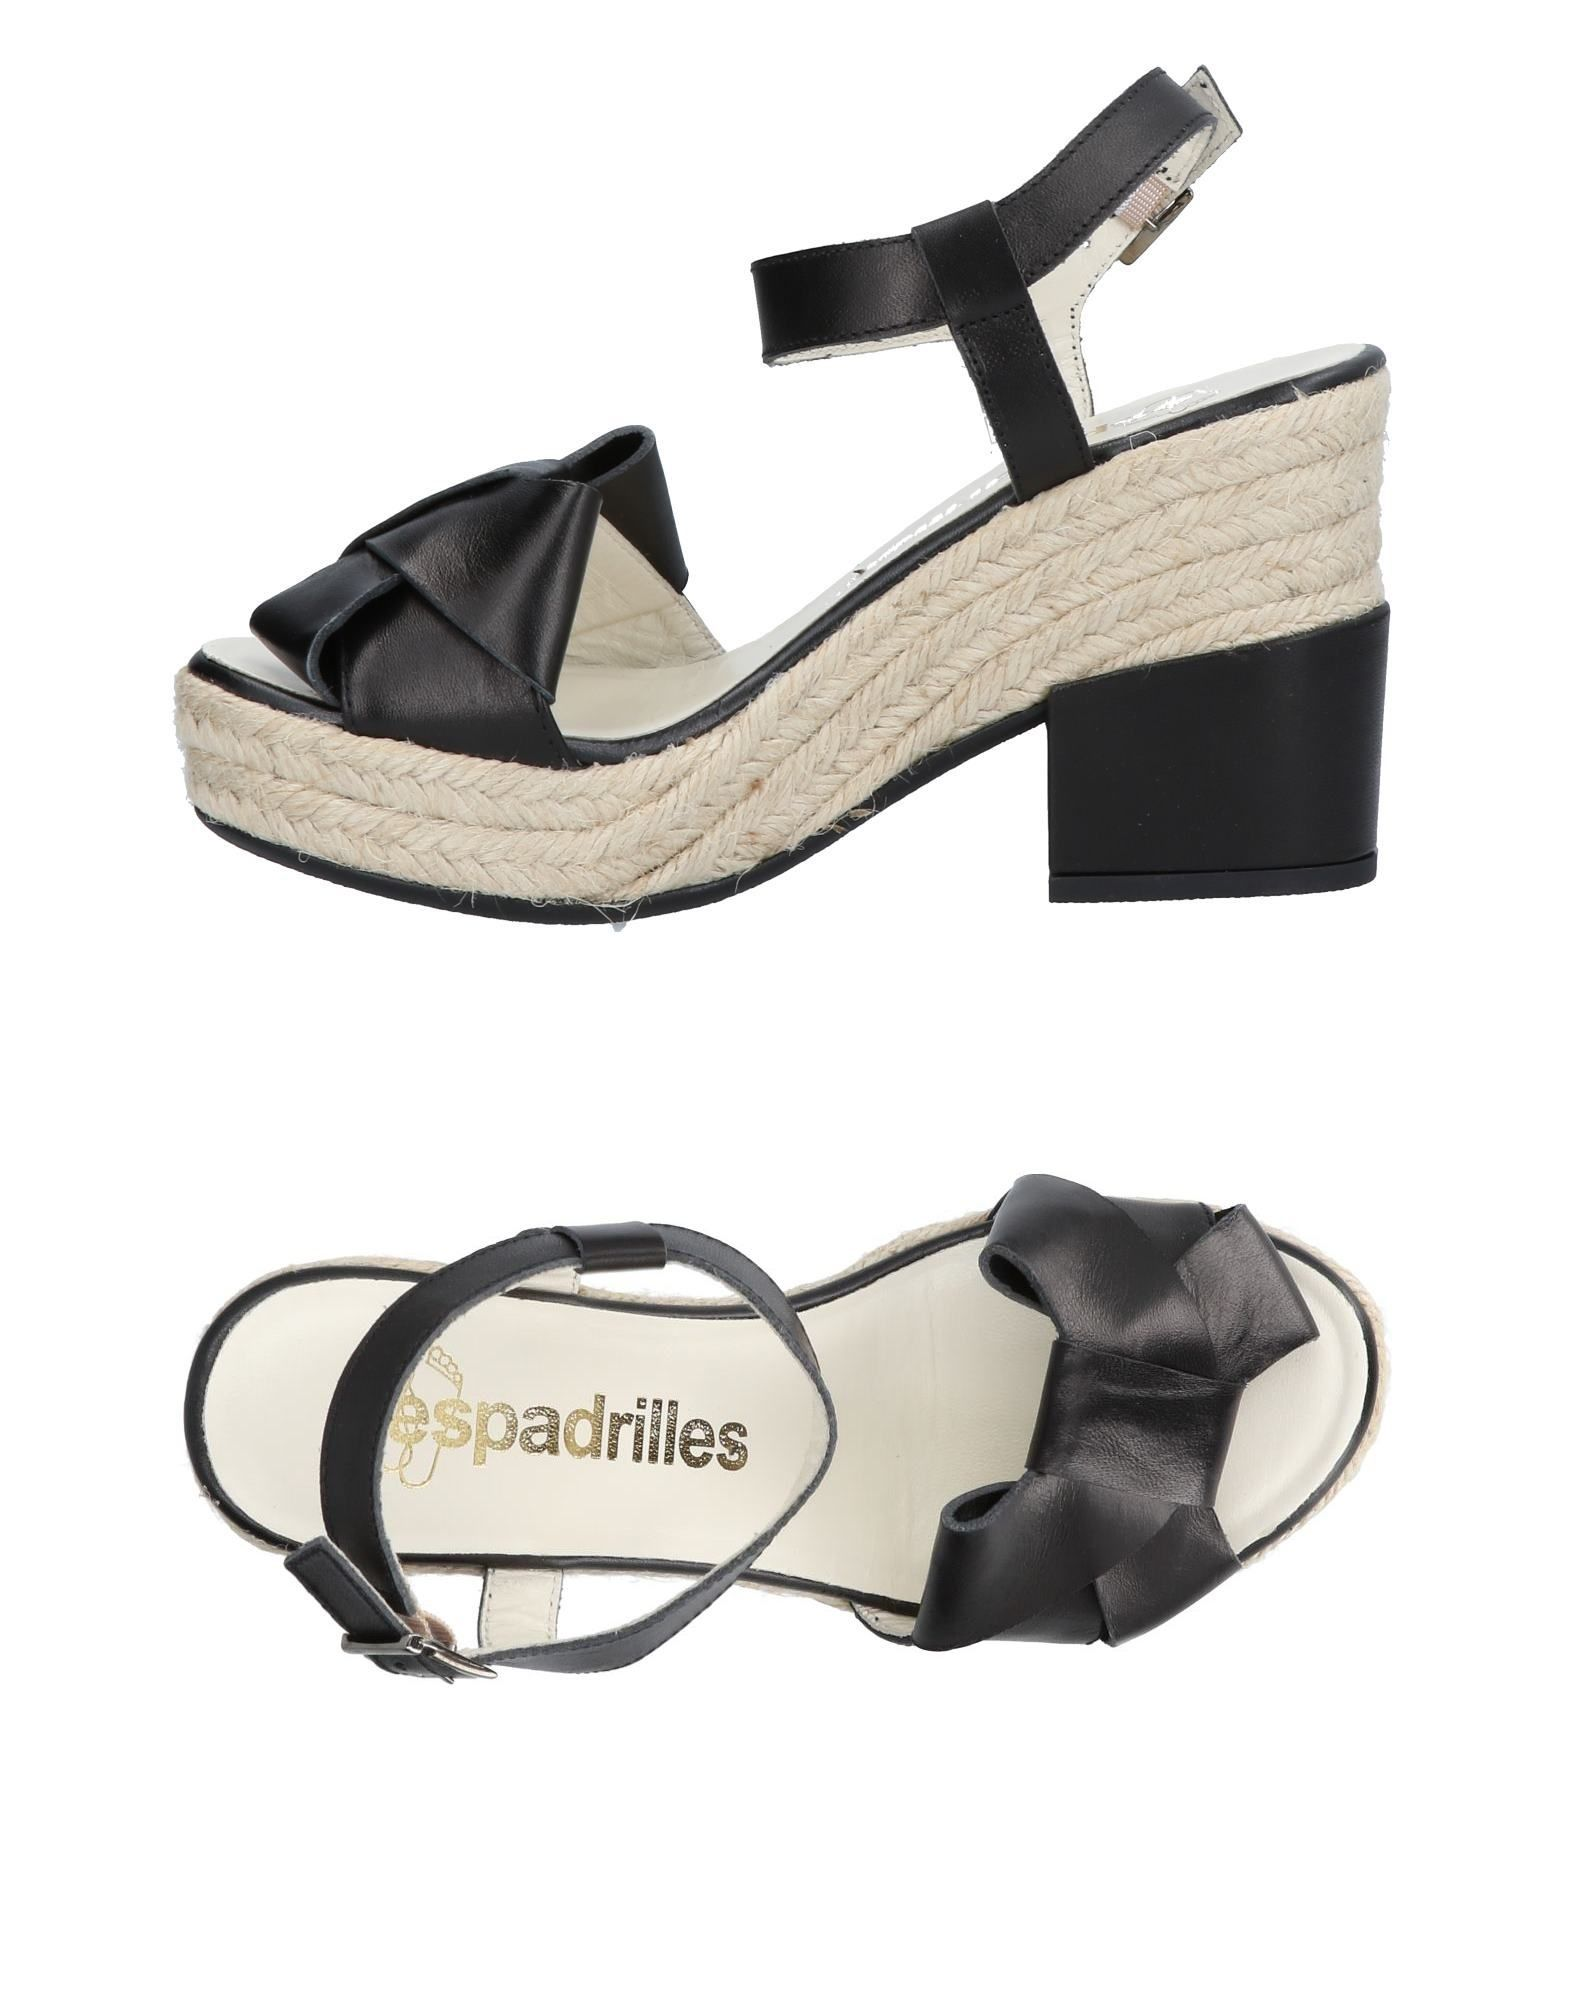 Cómodo y bien parecido Sandalia Sandalia parecido Espadrilles Mujer - Sandalias Espadrilles  Negro 93345c